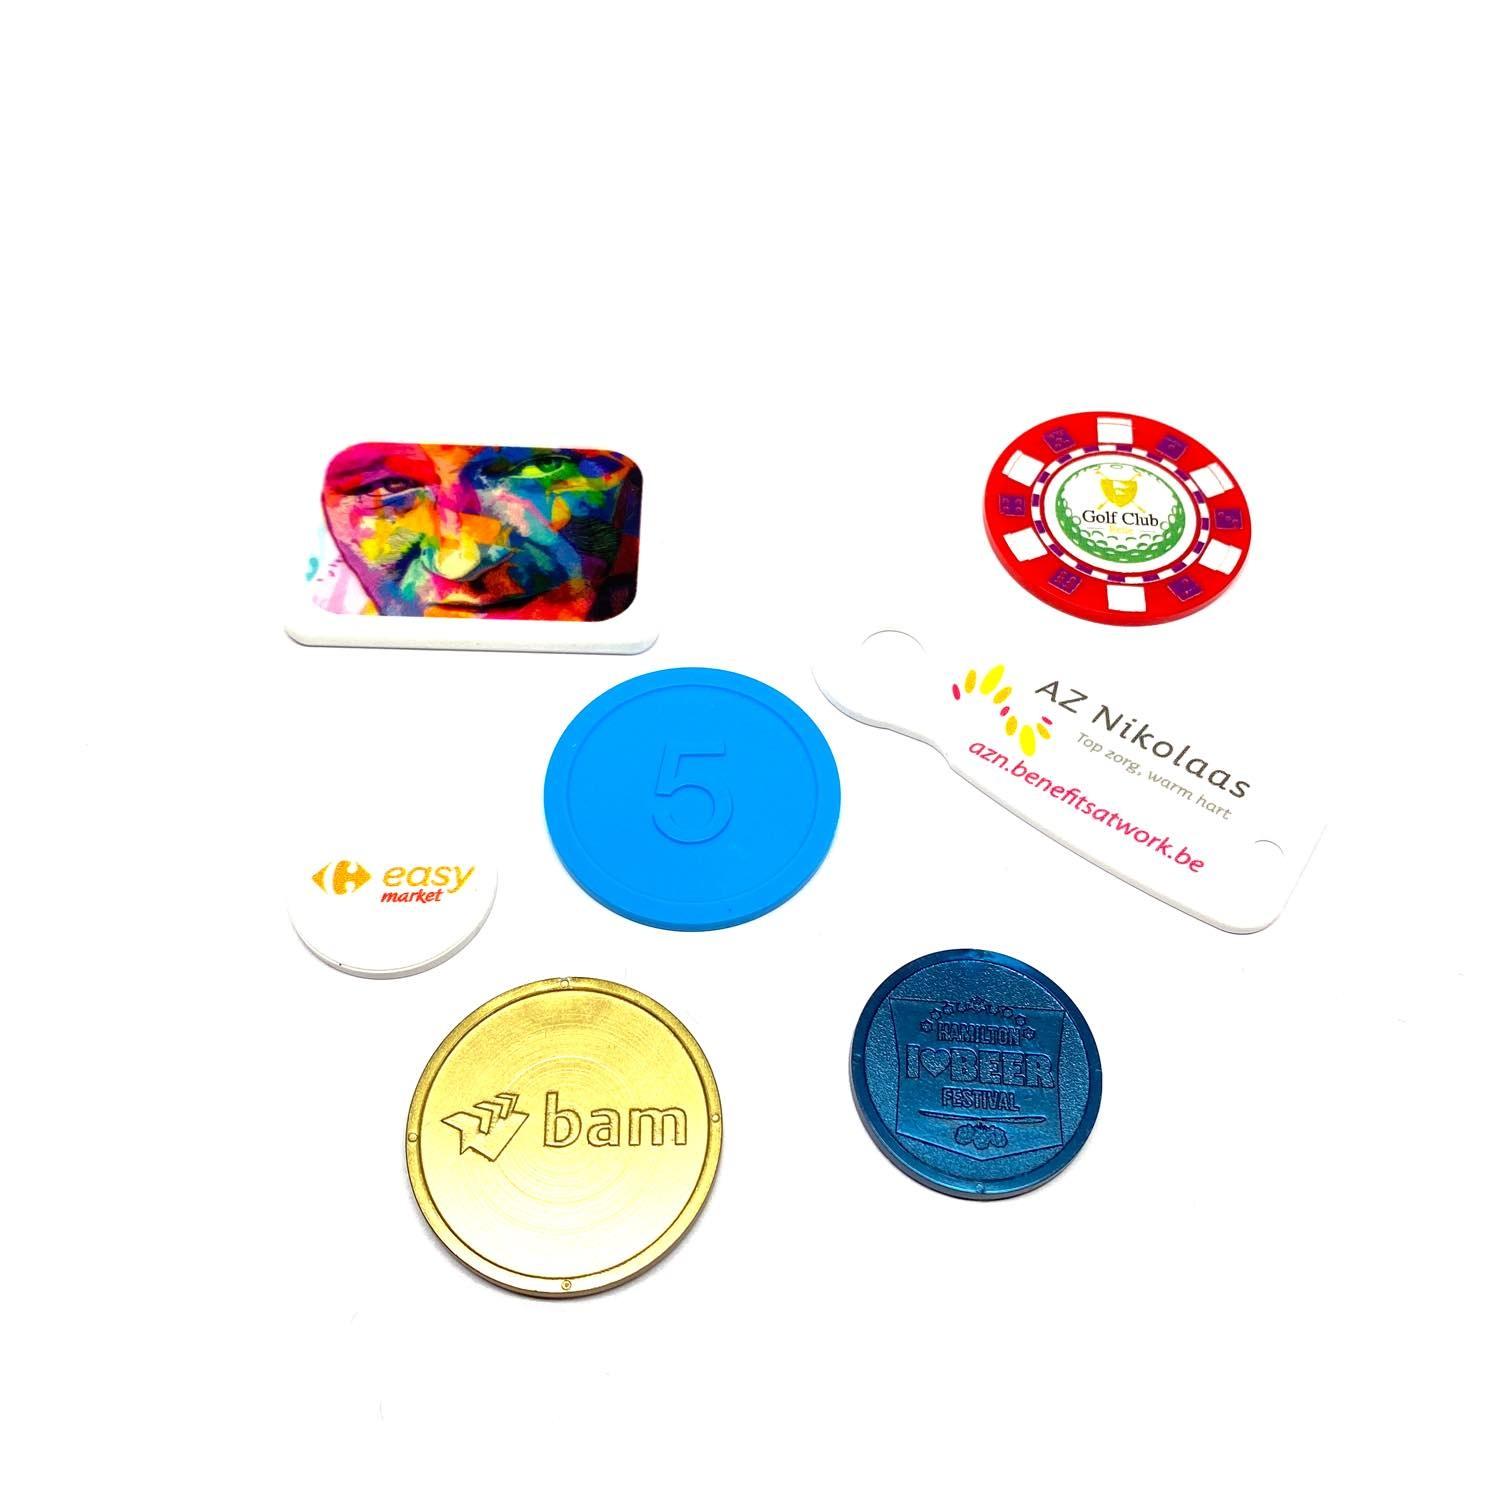 Plastic tokens